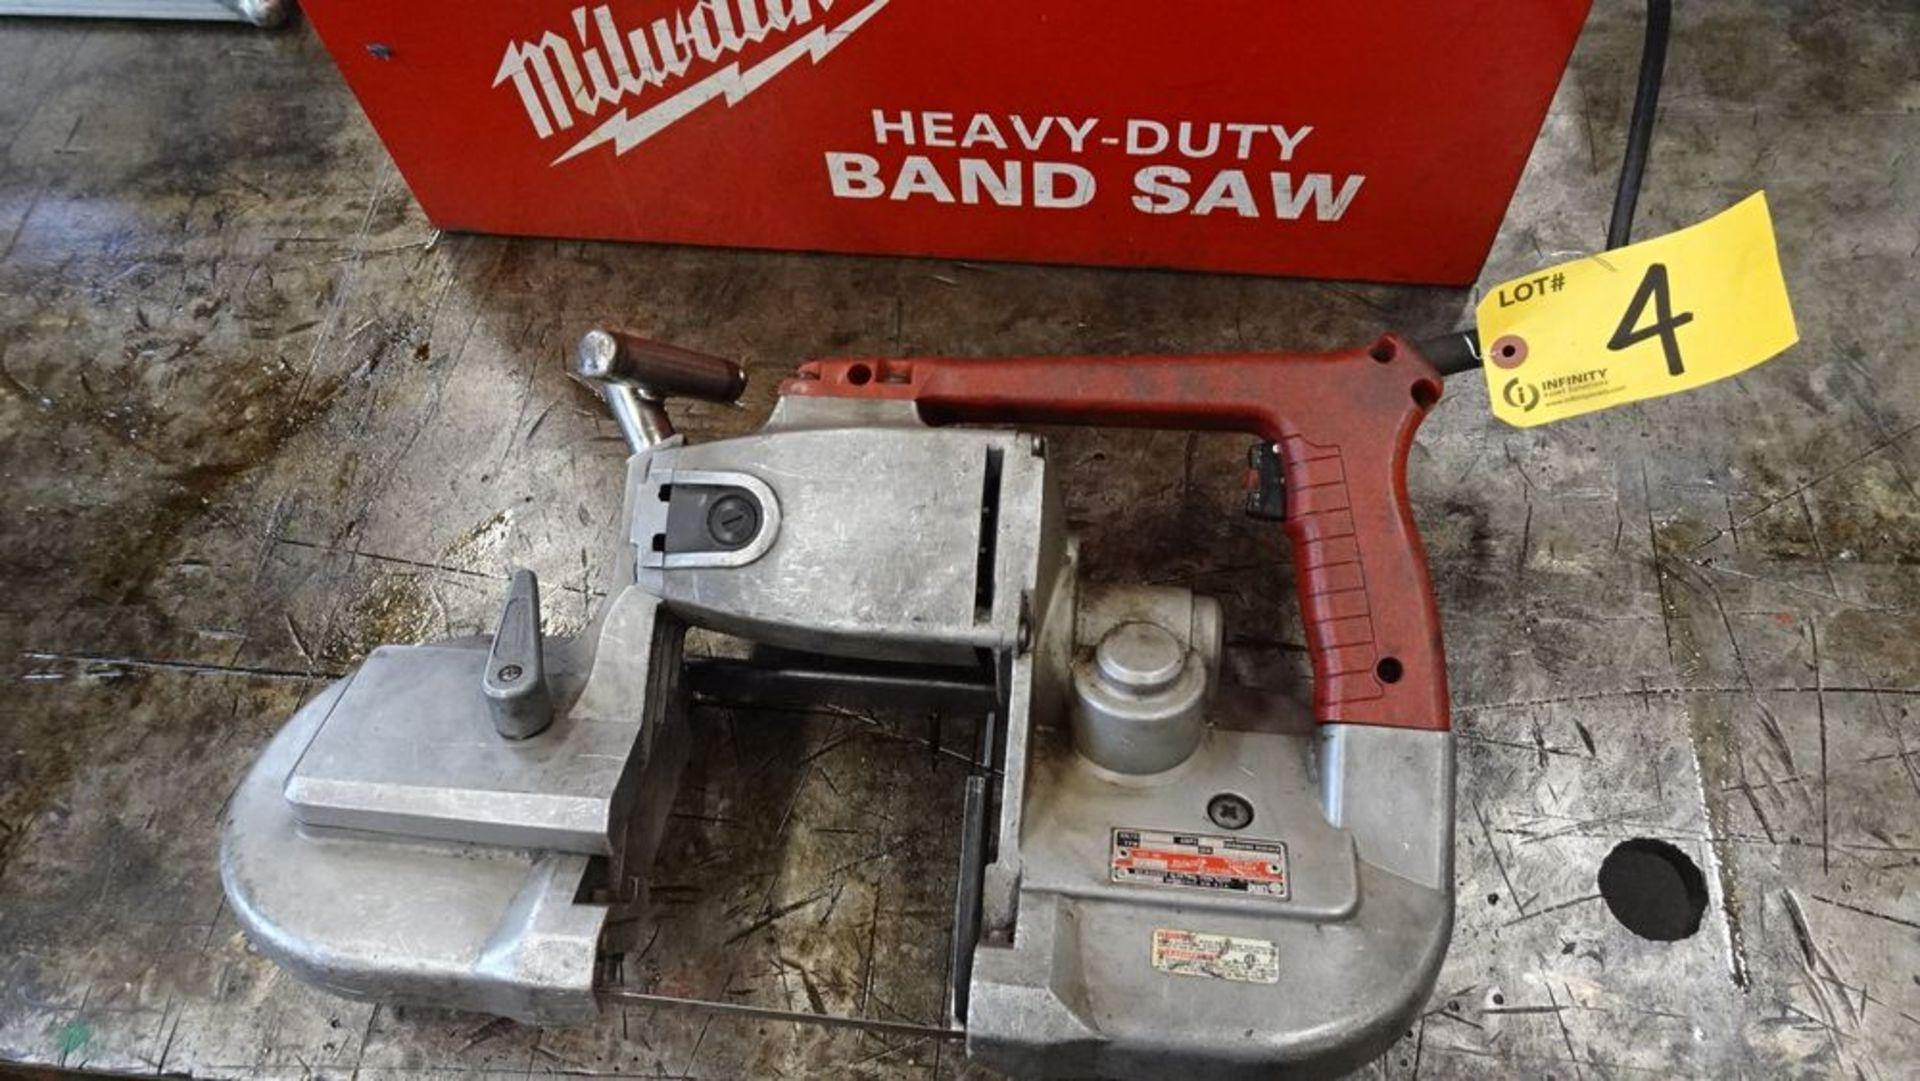 Lot 4 - MILWAUKEE 6230 HEAVY DUTY PORTABLE BANDSAW, 120V, C/W CASE, S/N 000673137